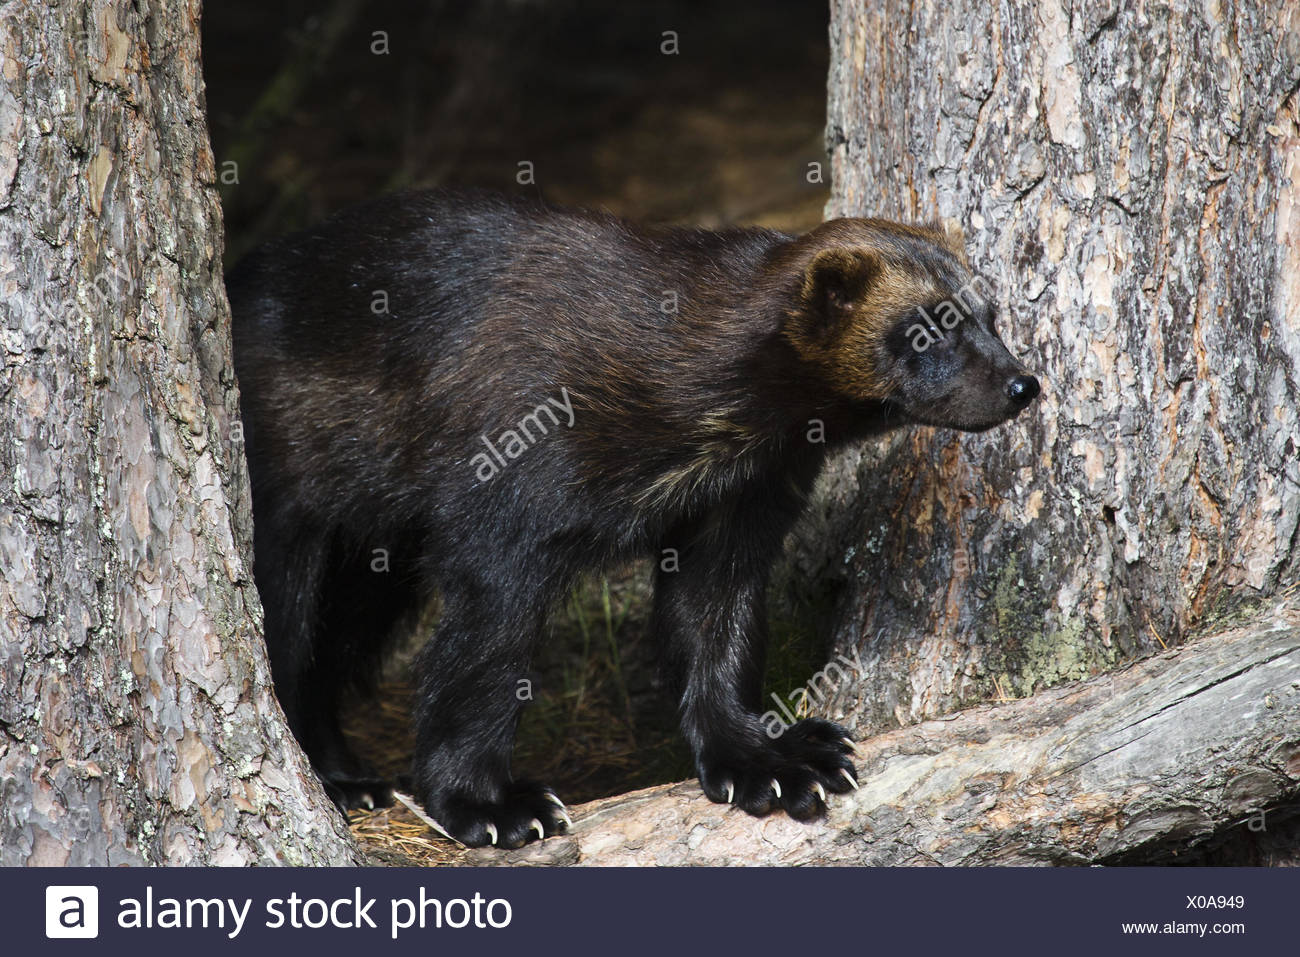 wolverine between trees Stock Photo